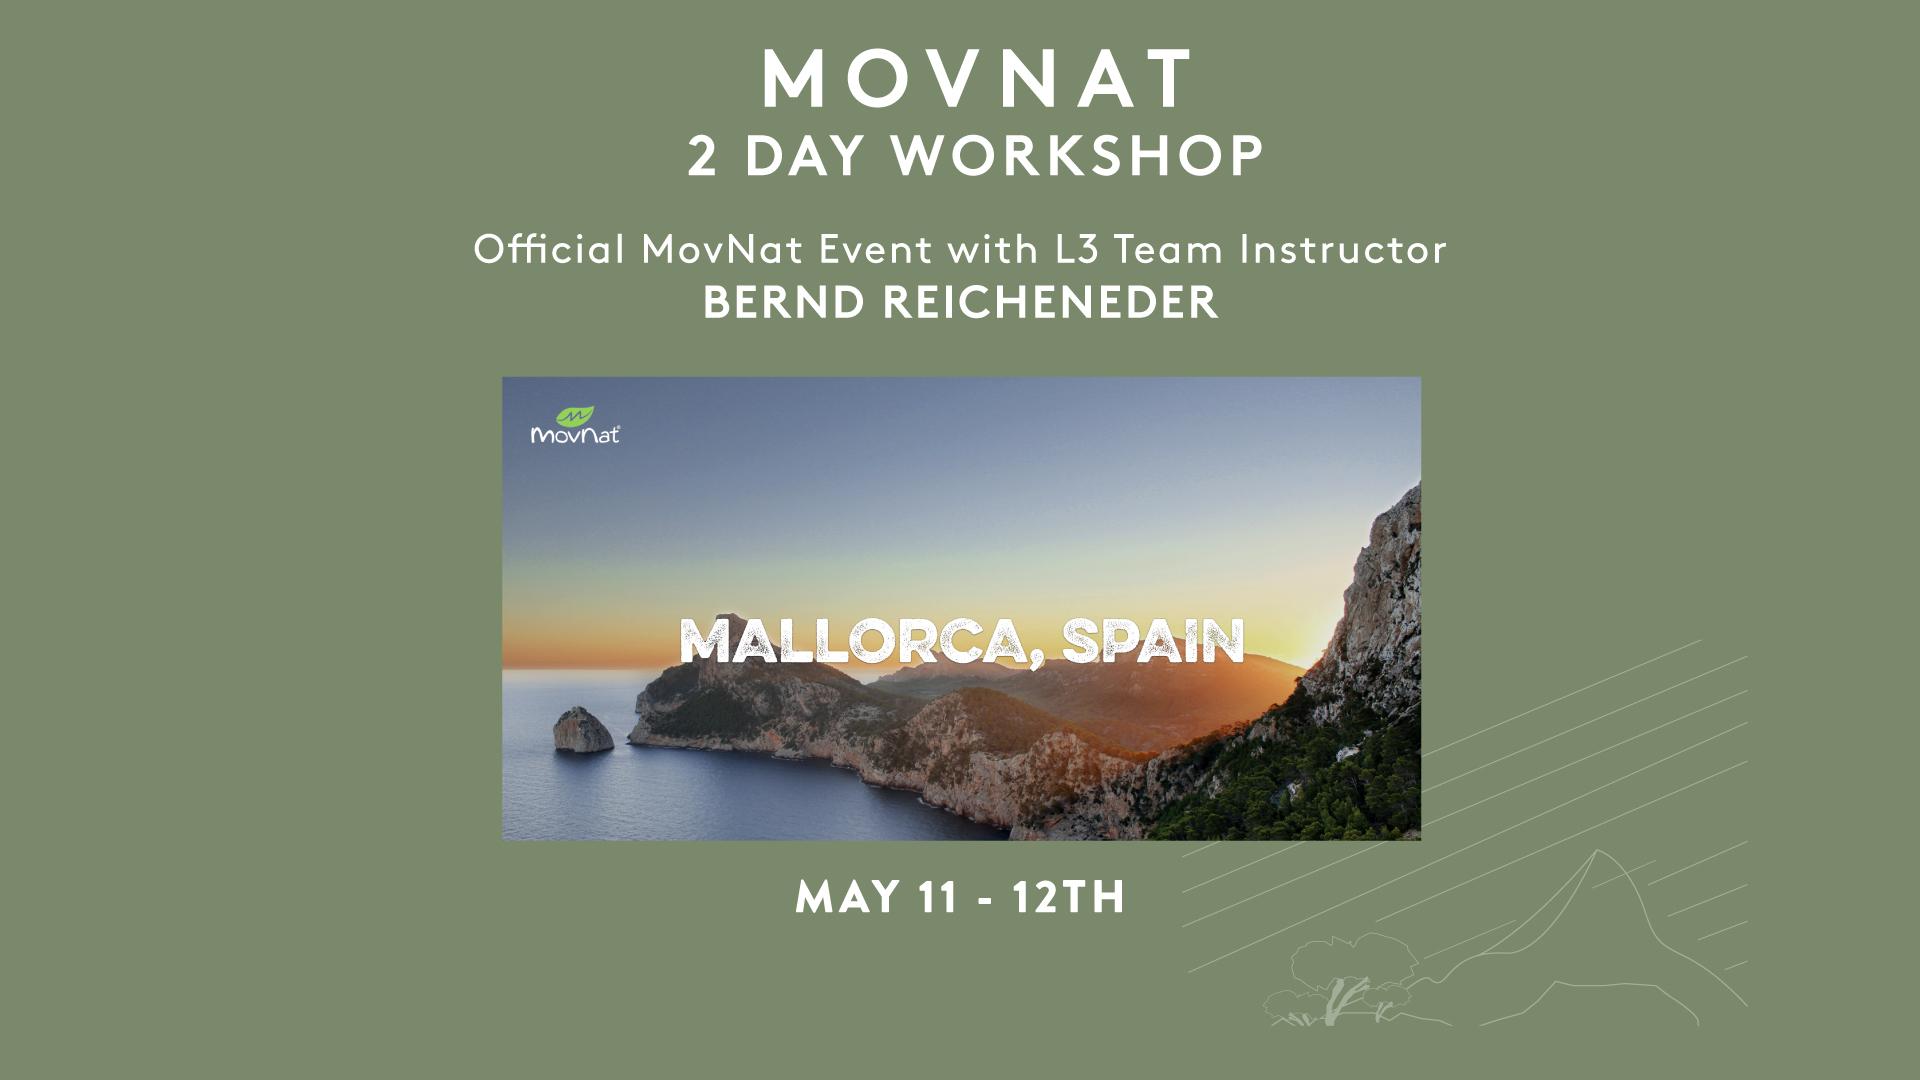 MovNat-workshop-web-1920x1080px.jpg